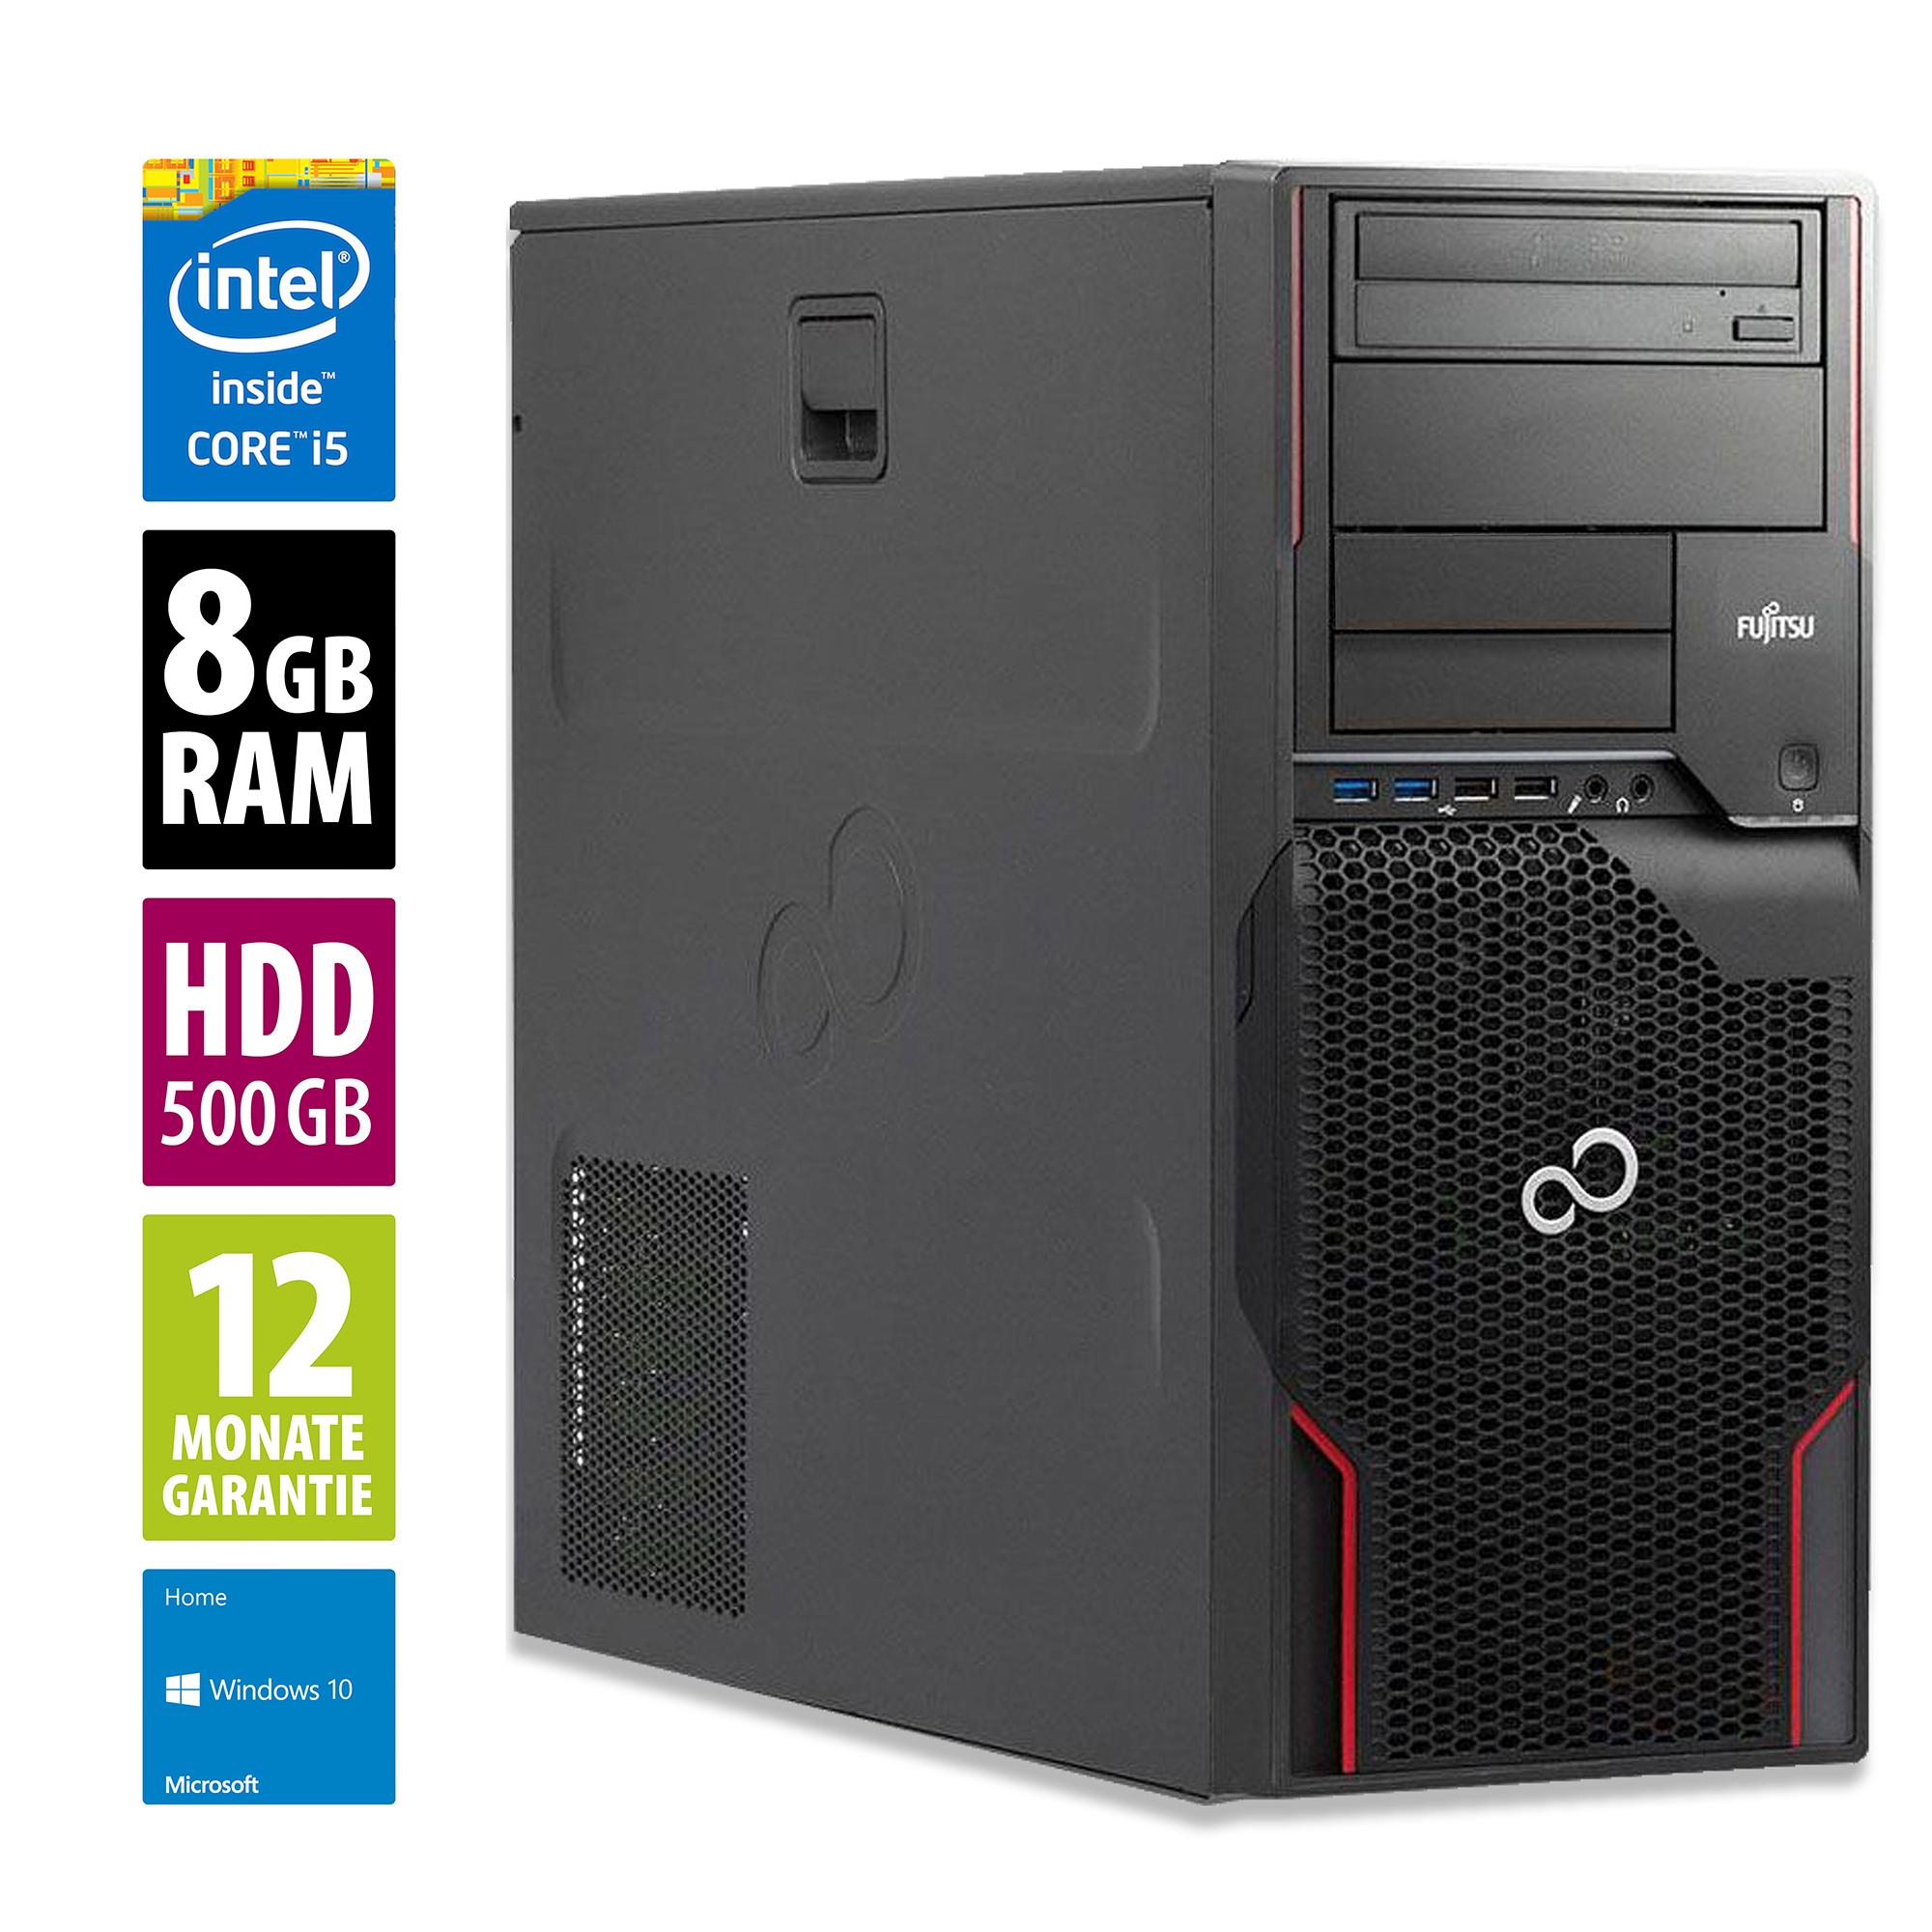 Office PC i5 2400 - 8GB RAM - 500GB HDD inkl Windows 10 - 12 Monate Garantie [AfB Shop] (evtl. Gaming?)